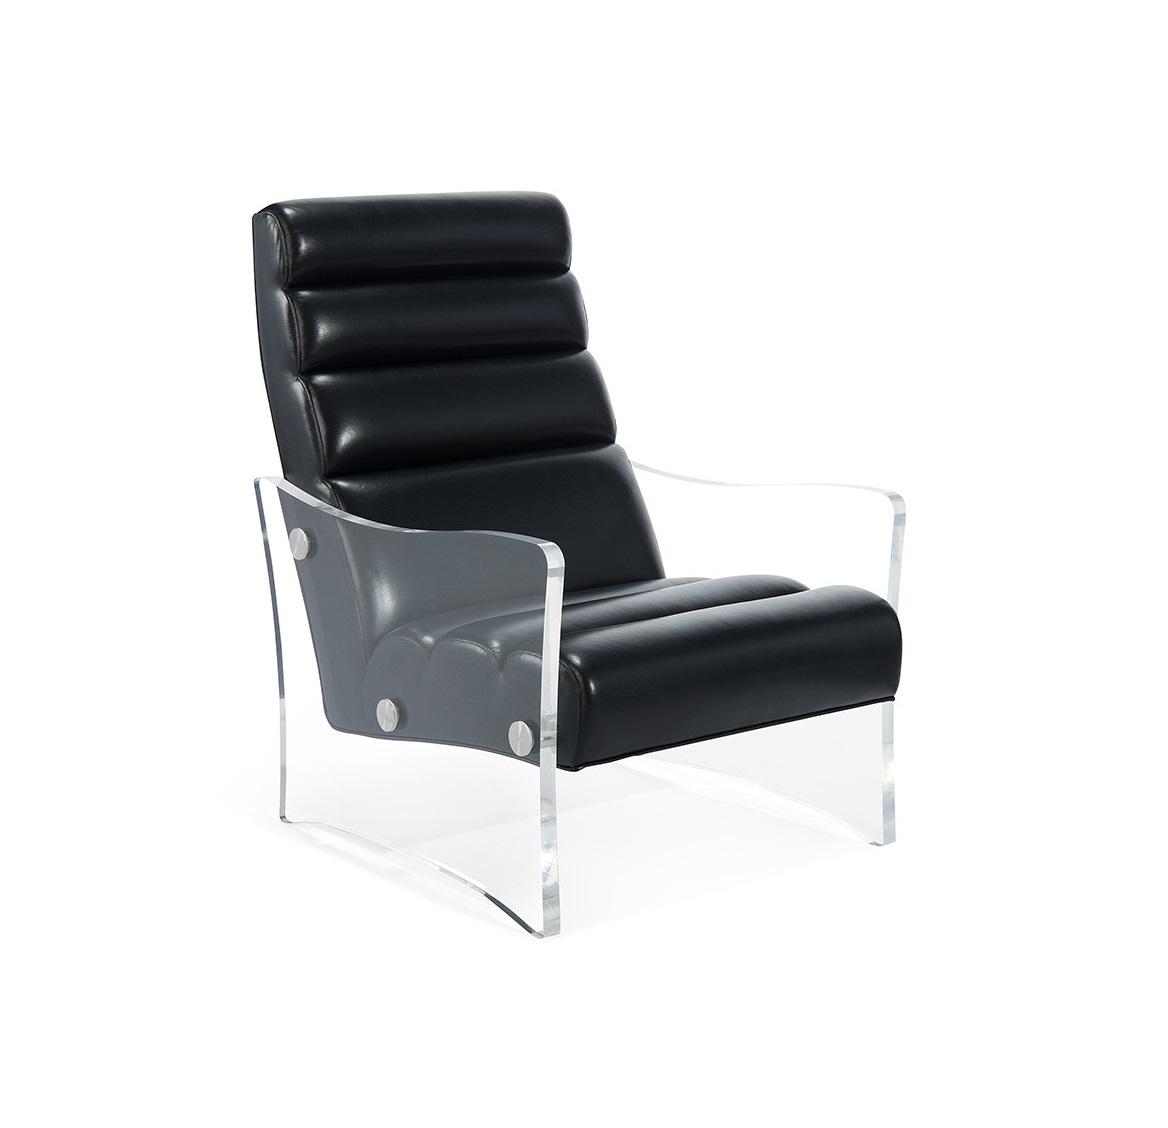 Clarity Lounge Chair, John Richard Chair